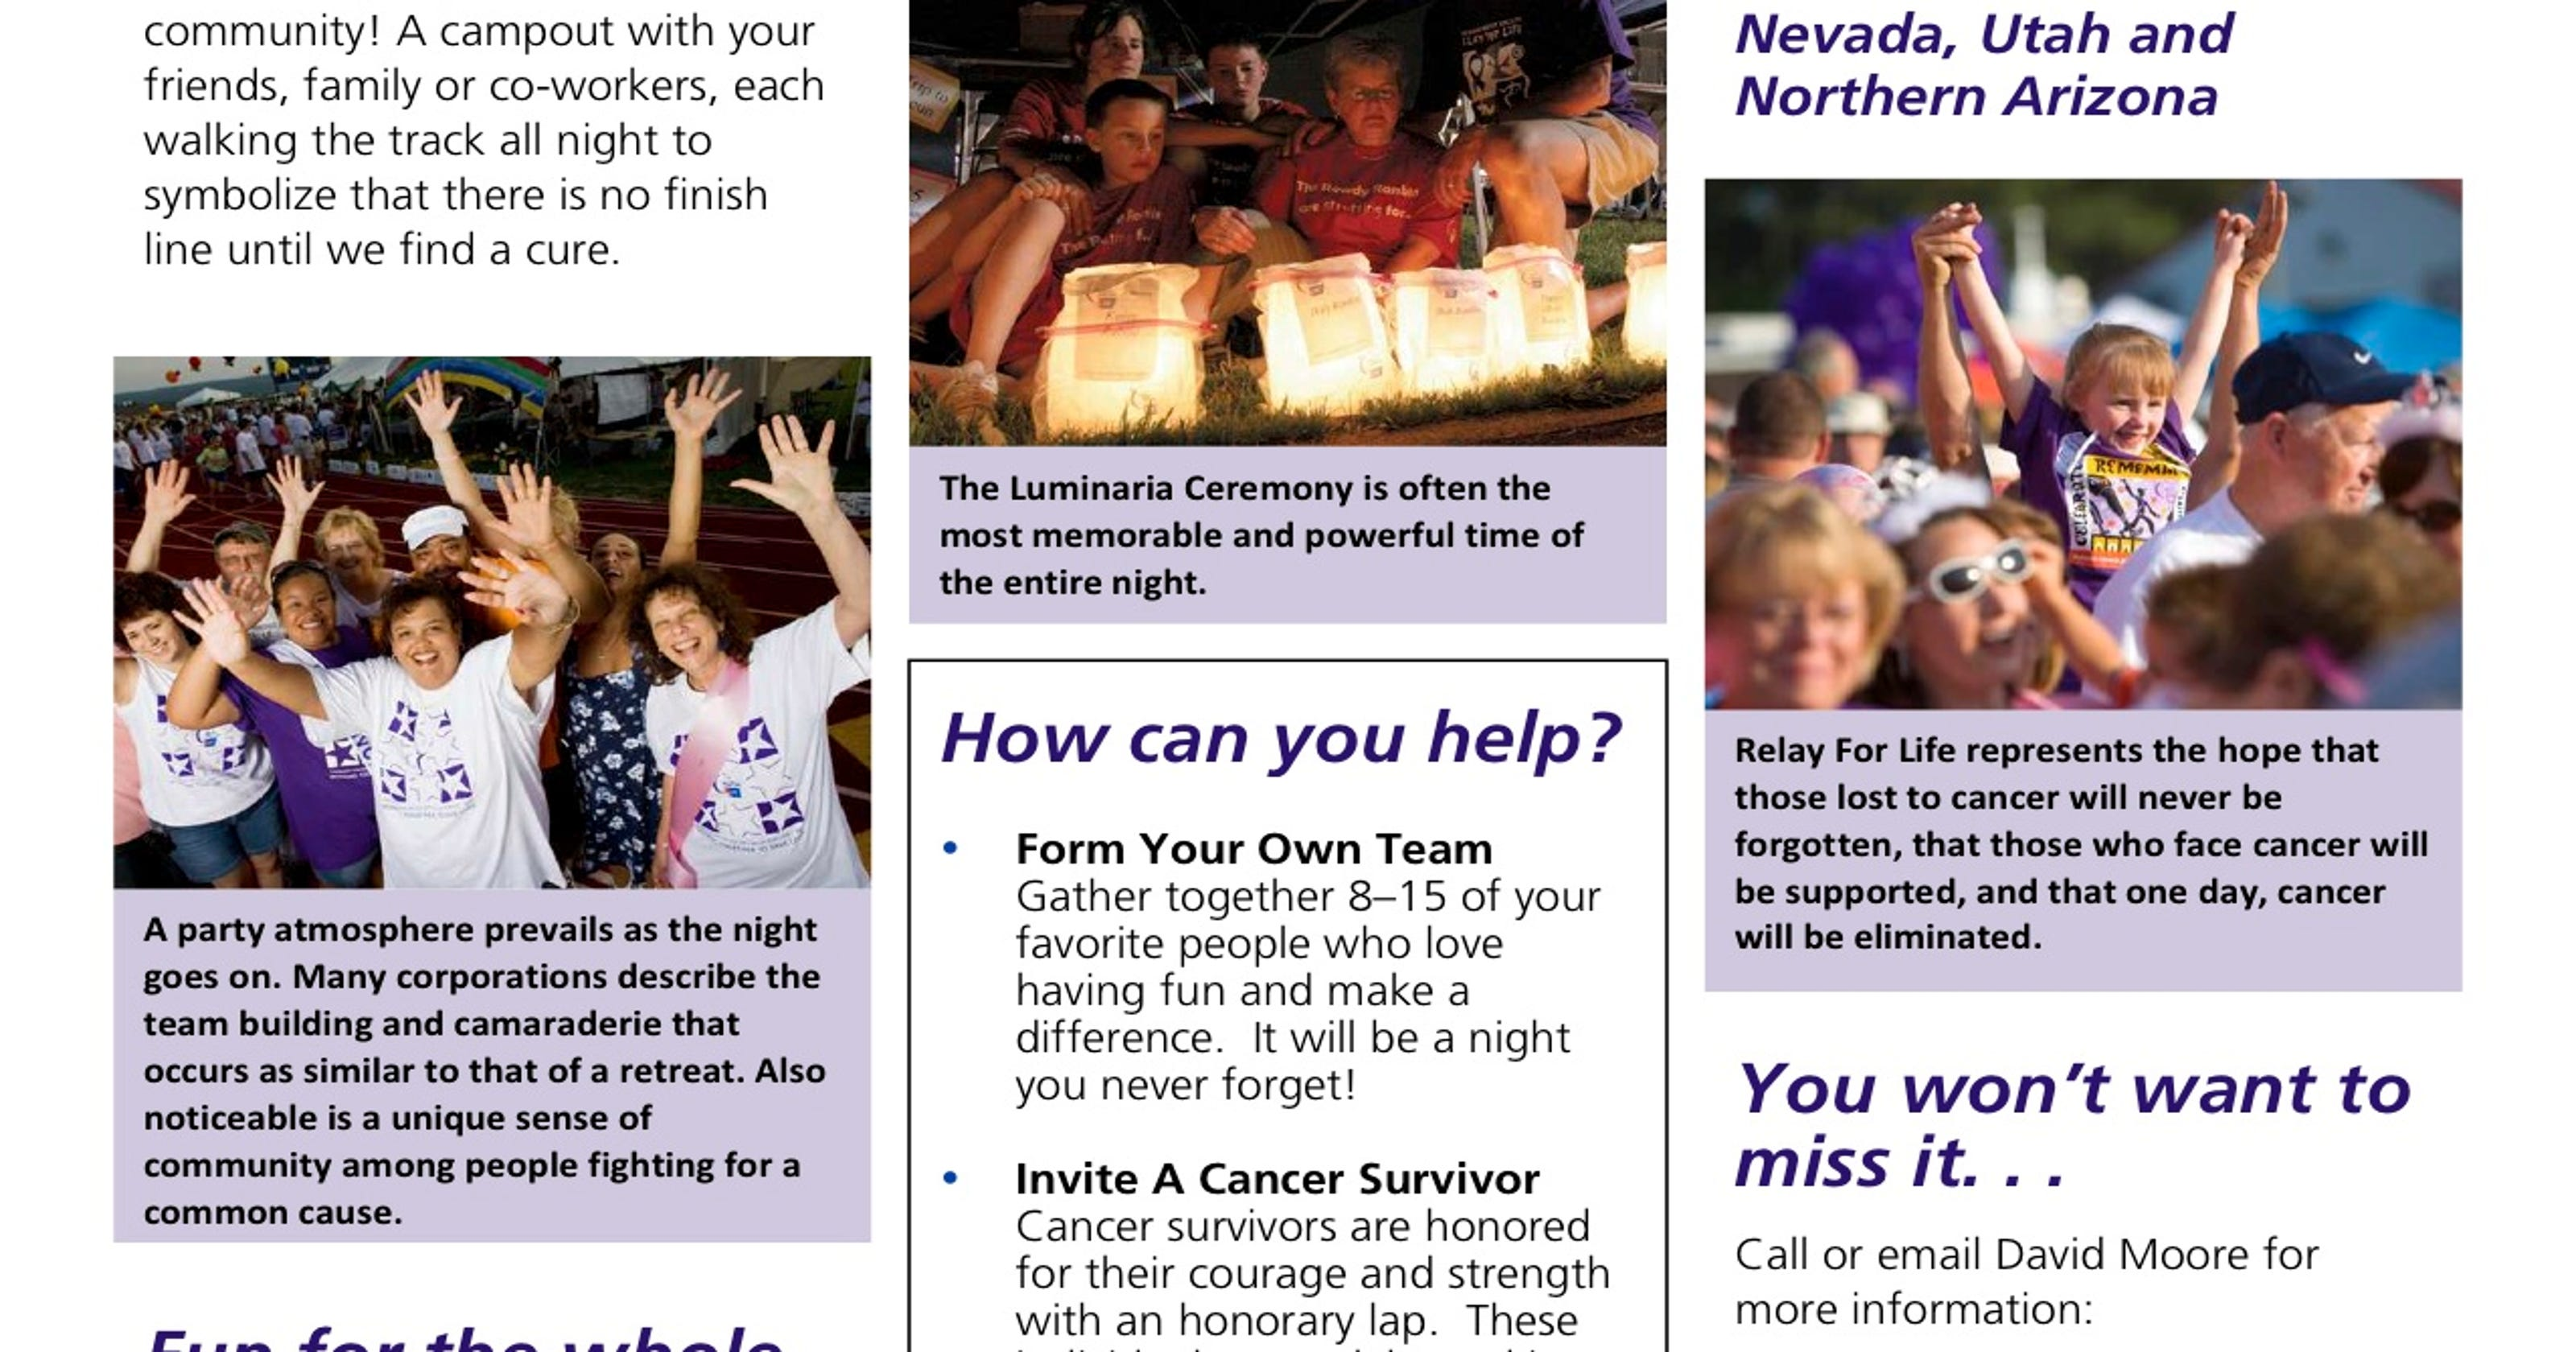 cancer survivors caregivers wanted